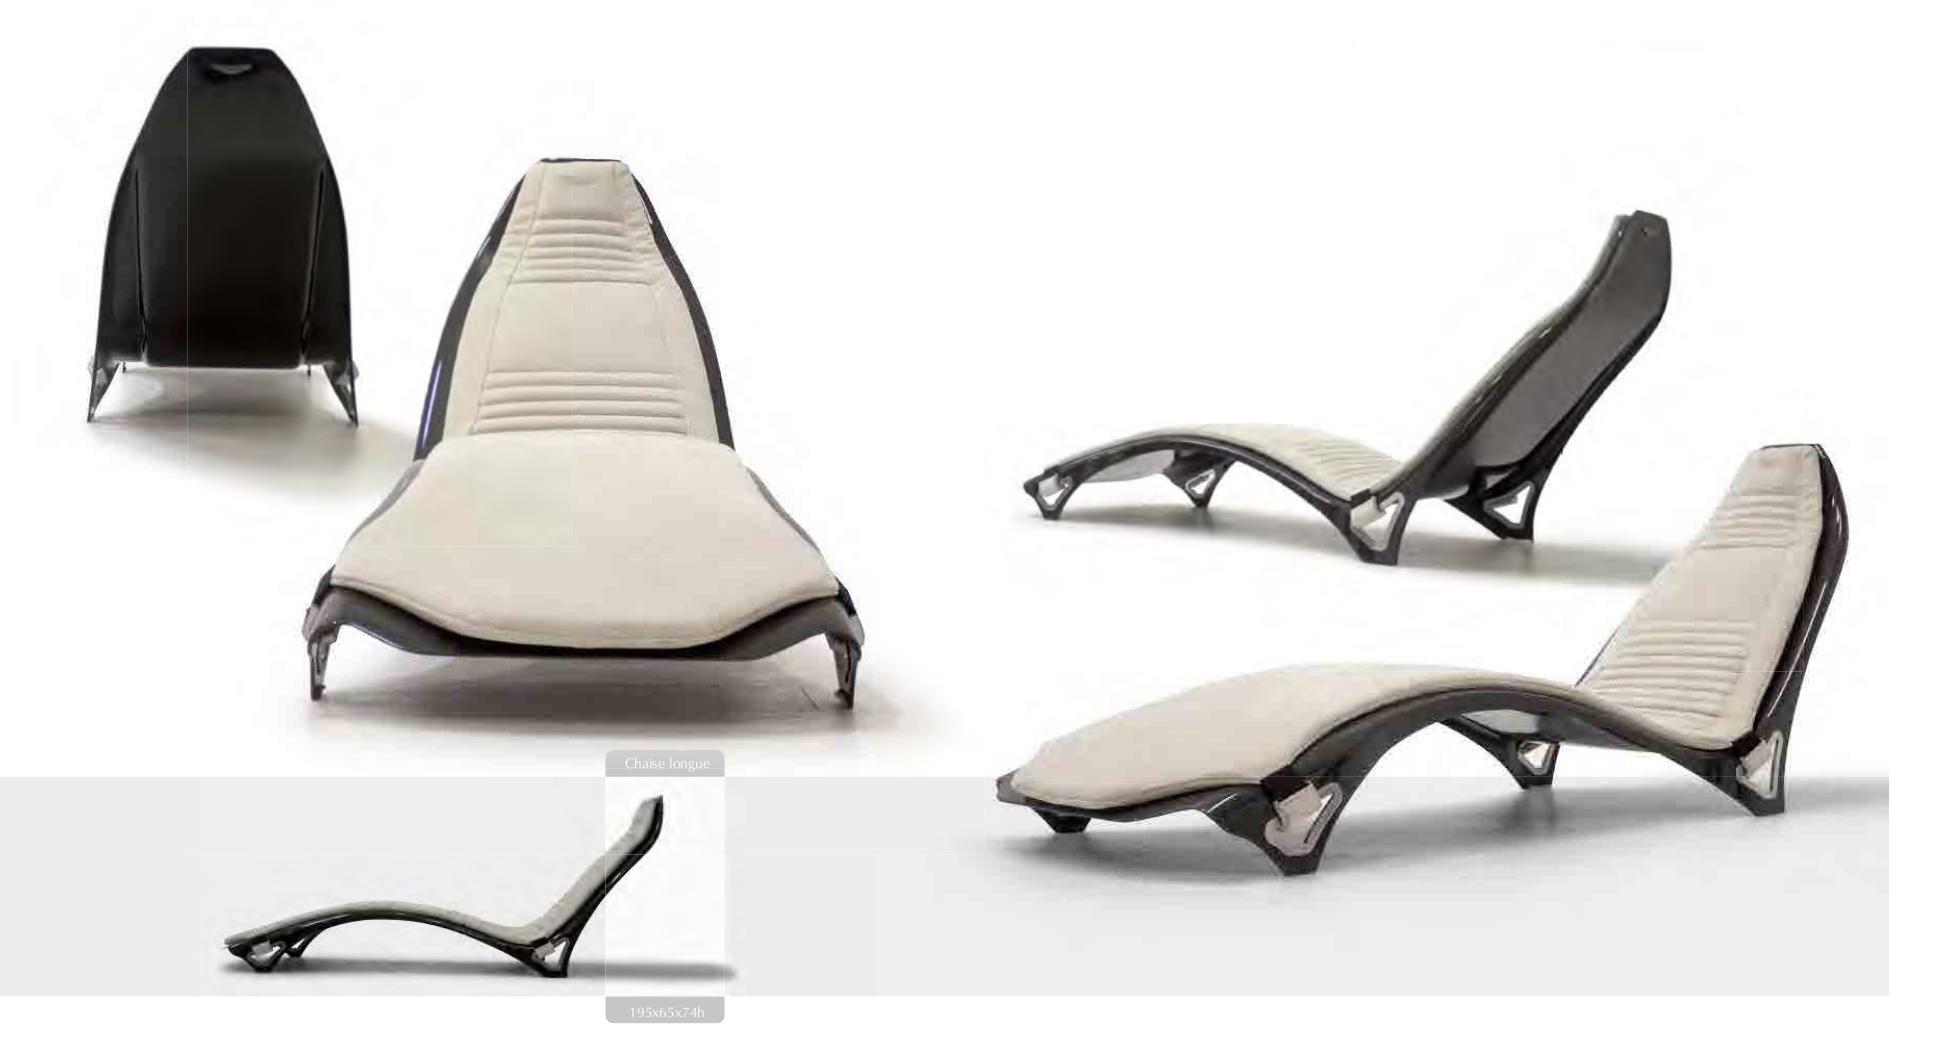 aston martin v007 chaise longue marbella.jpg